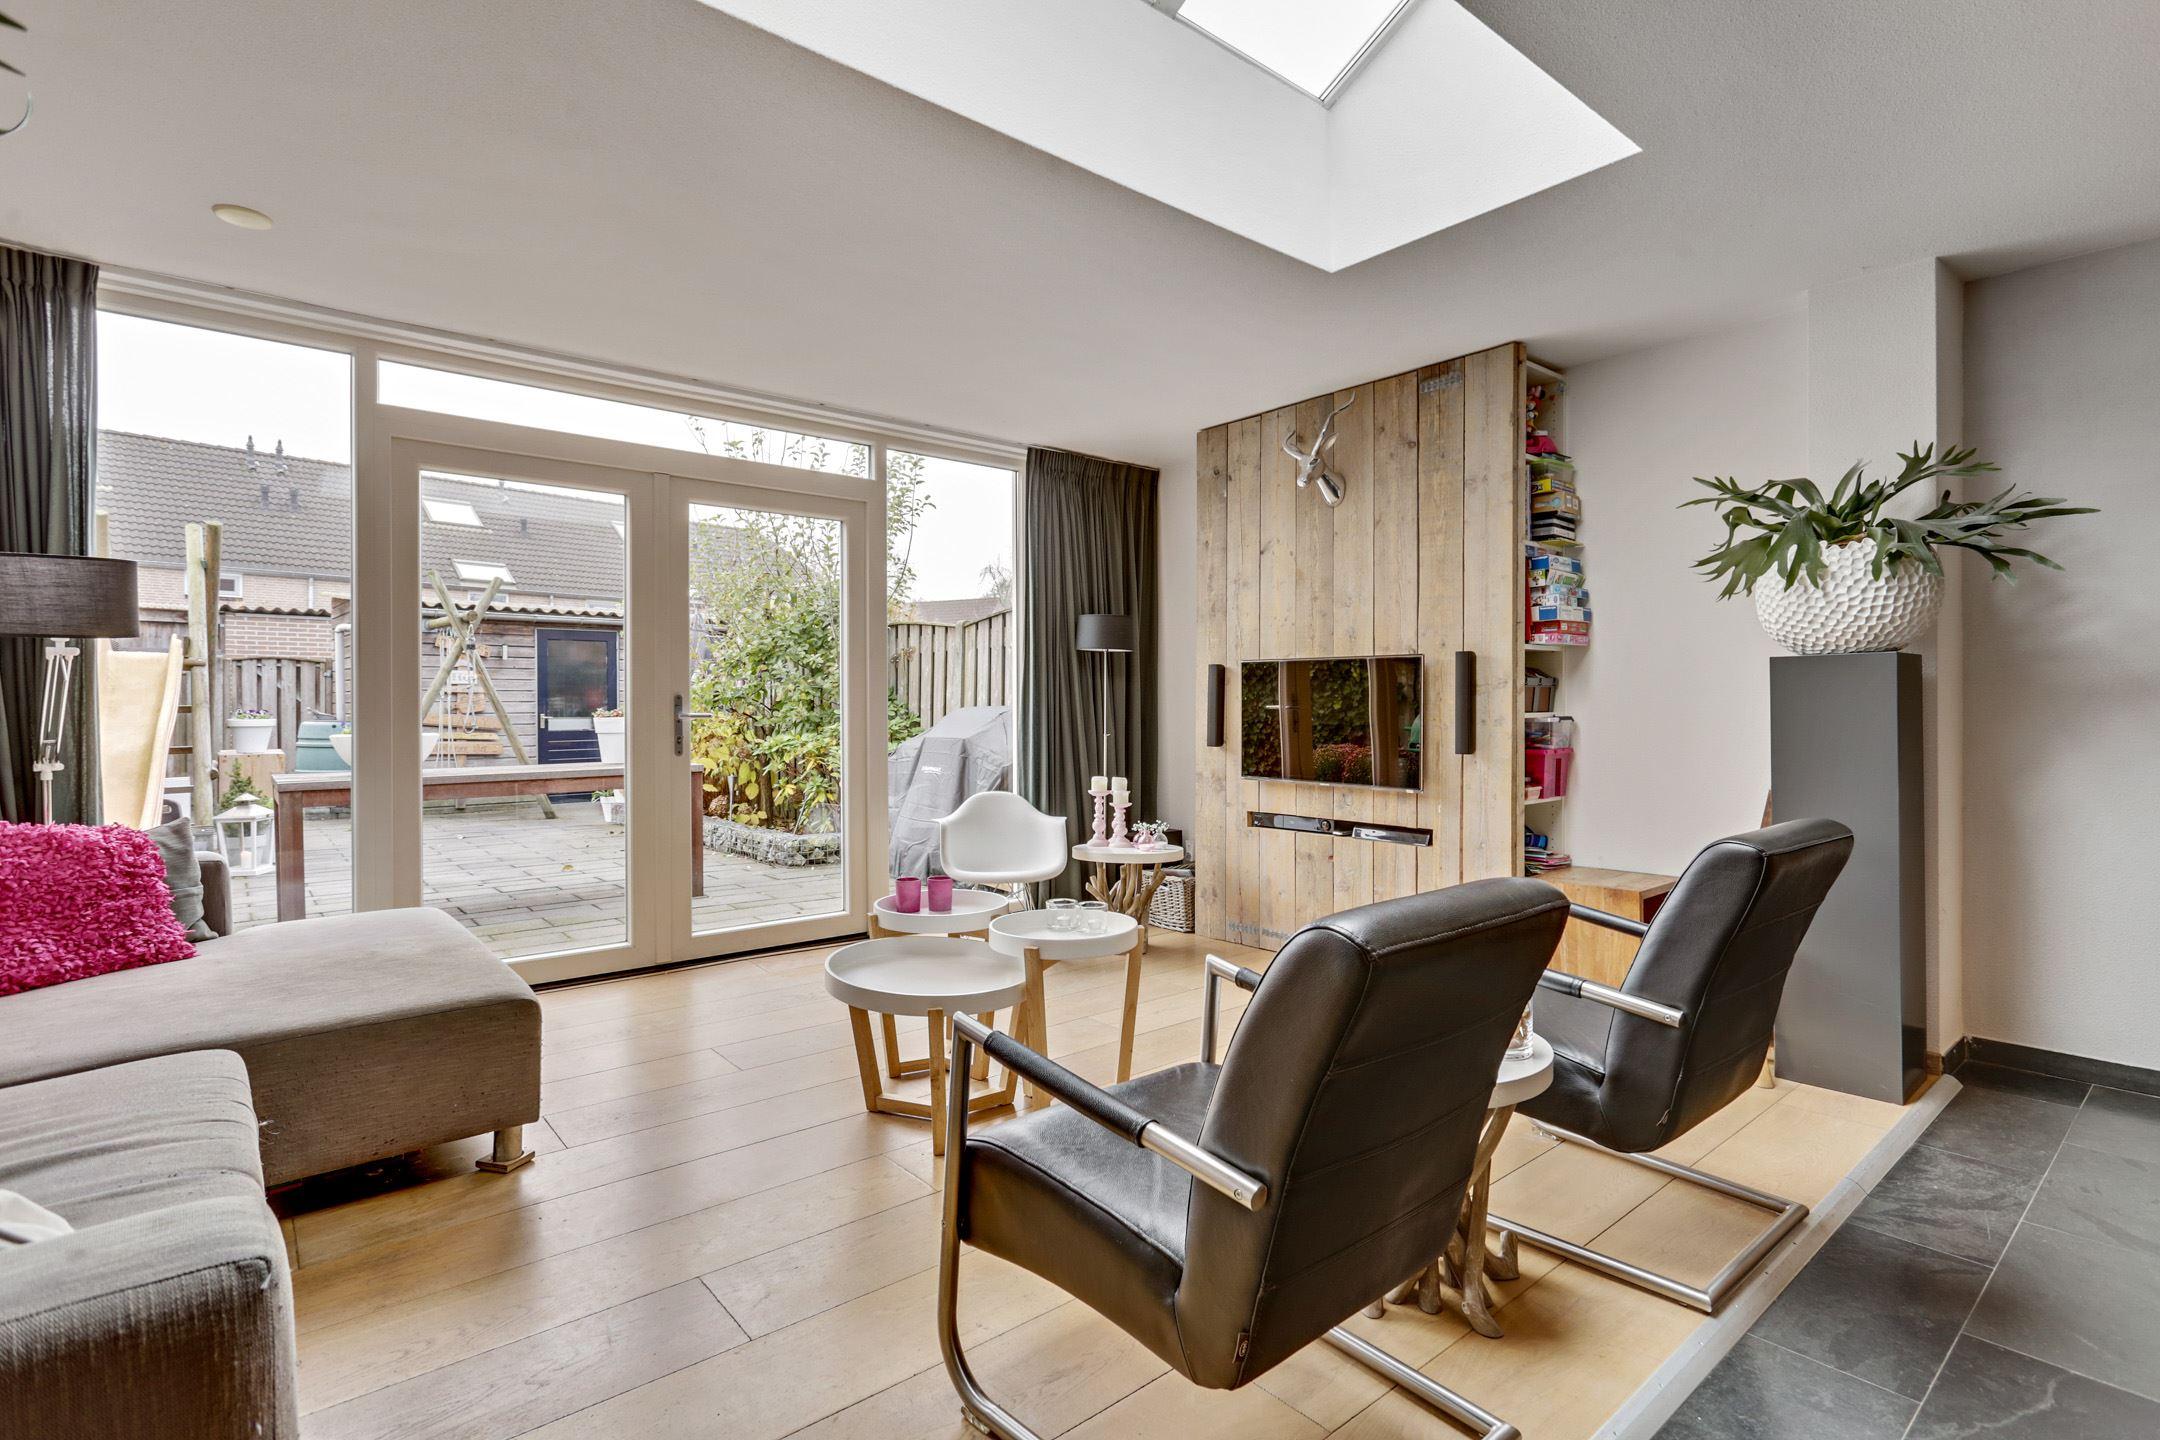 Huis te koop: Bieslook 45 5063 EB Oisterwijk [funda]